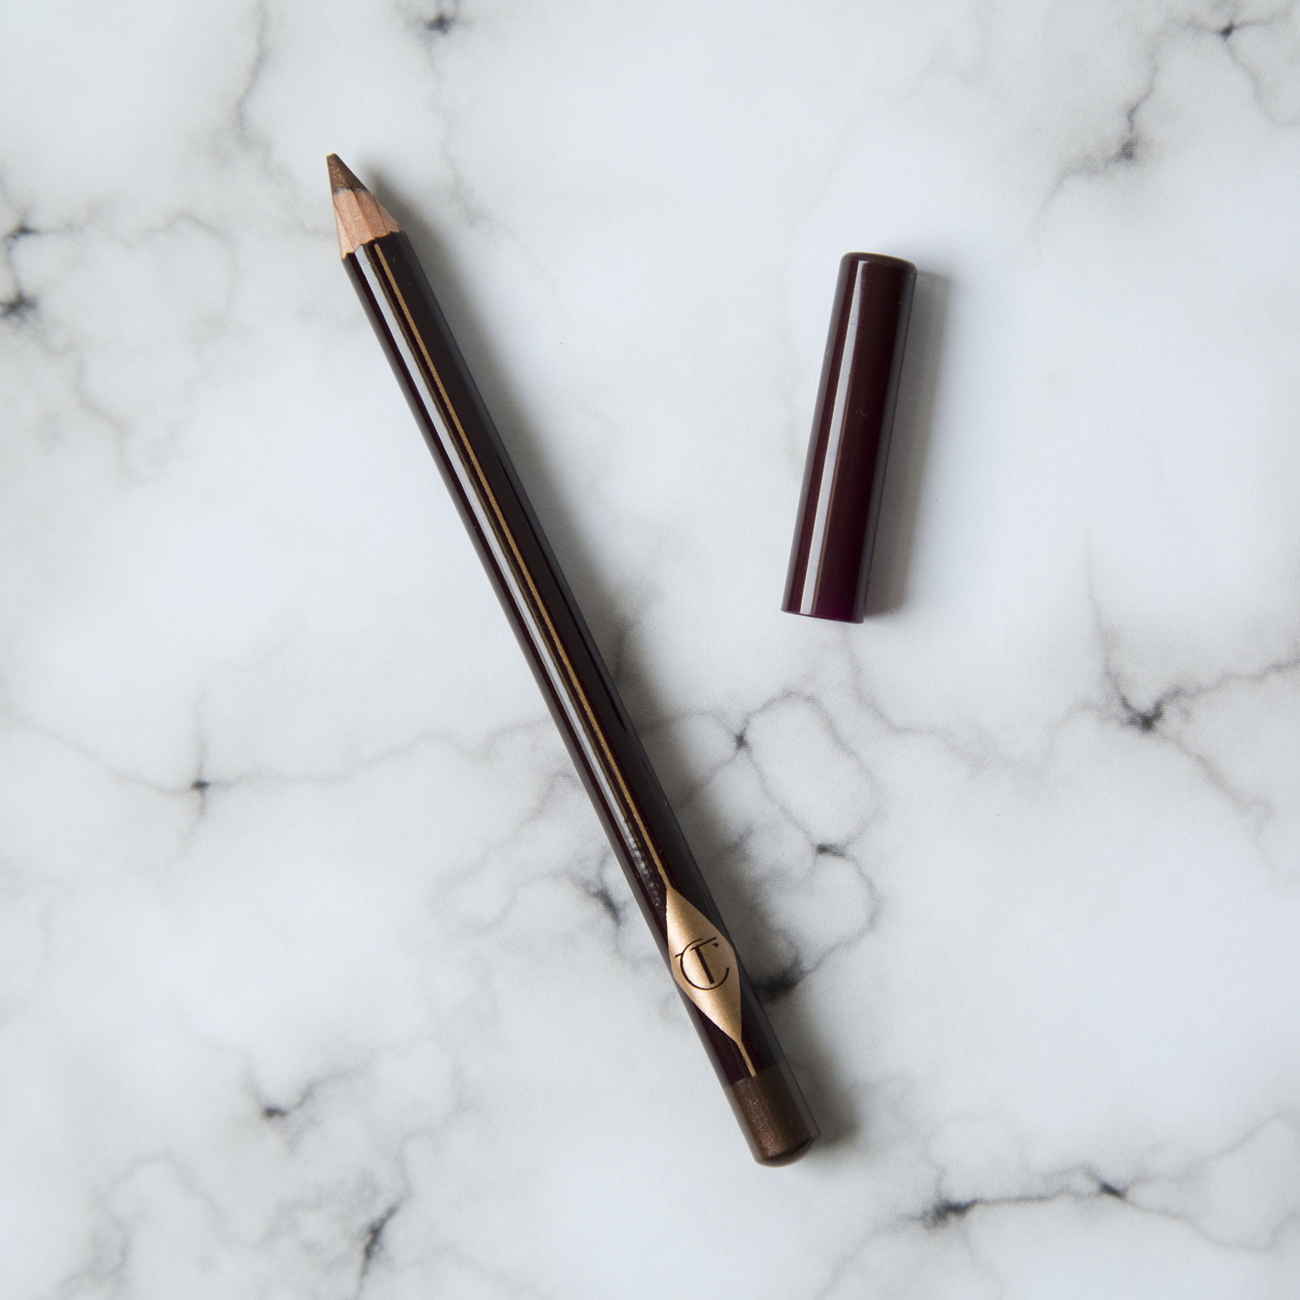 Charlotte Tilbury Classic Eye Pencil in Sophia